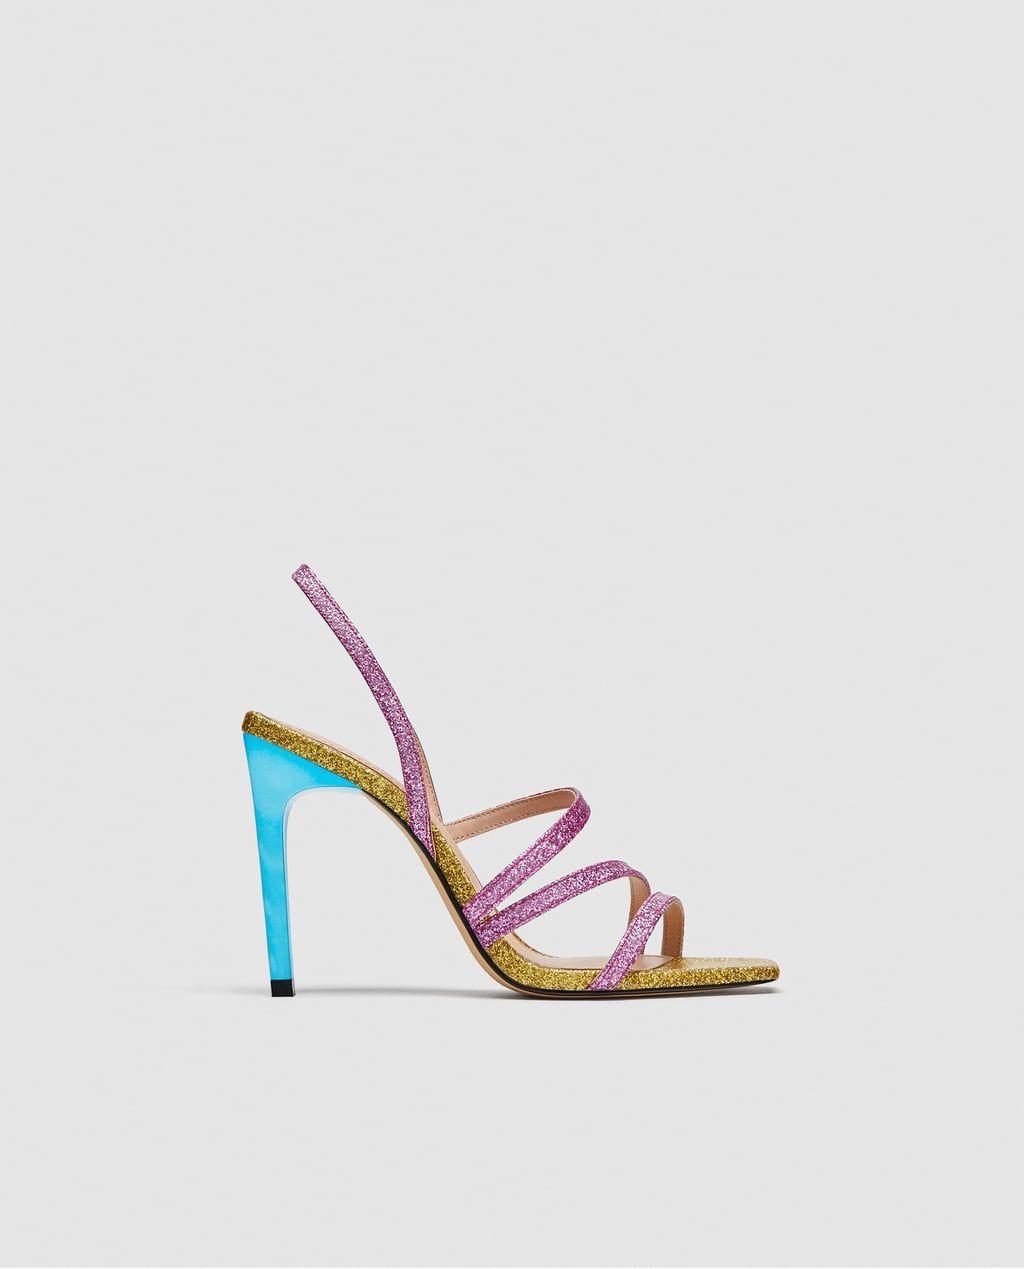 dirt cheap outlet store sale arrives SHINY MULTI-STRAP SANDALS-Heeled Sandals-SHOES-WOMAN-SALE | ZARA ...